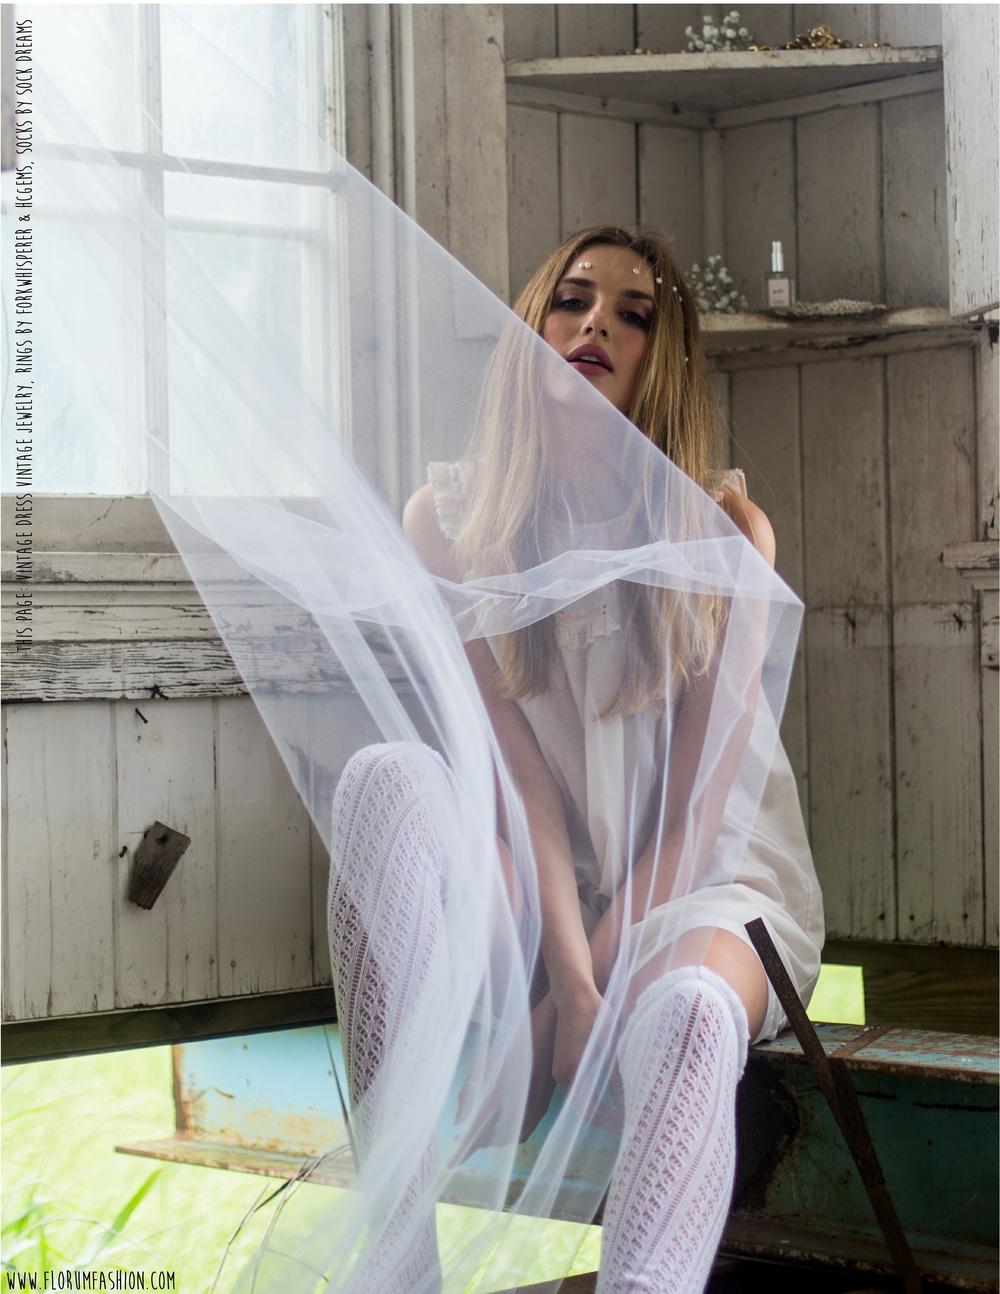 Vintage Dreams - Florum Fashion Magazine - Slow Fashion Movement - Monique Rodriguez - Grace Paulter - Urban Model Milano - Callidus Agency Dallas - Janelle Baughn - Tara Bernal Cipres -4.jpg